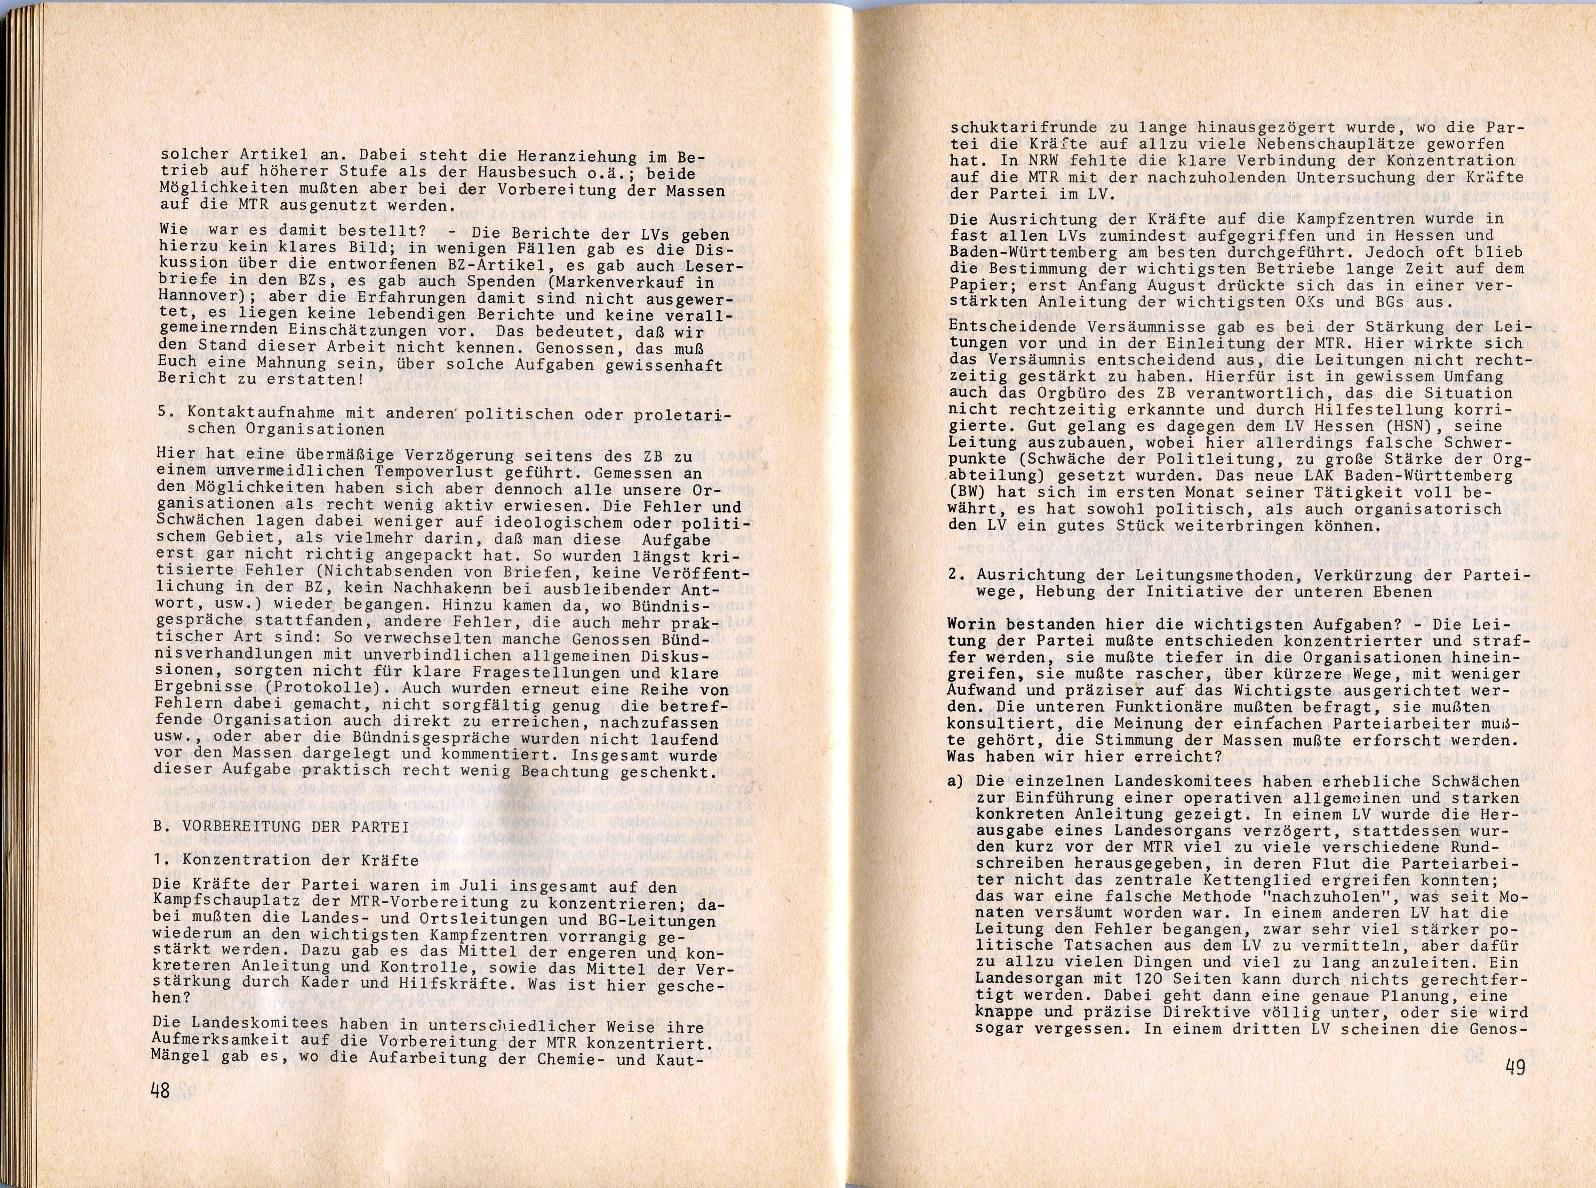 ZB_Parteiarbeiter_1971_07_26